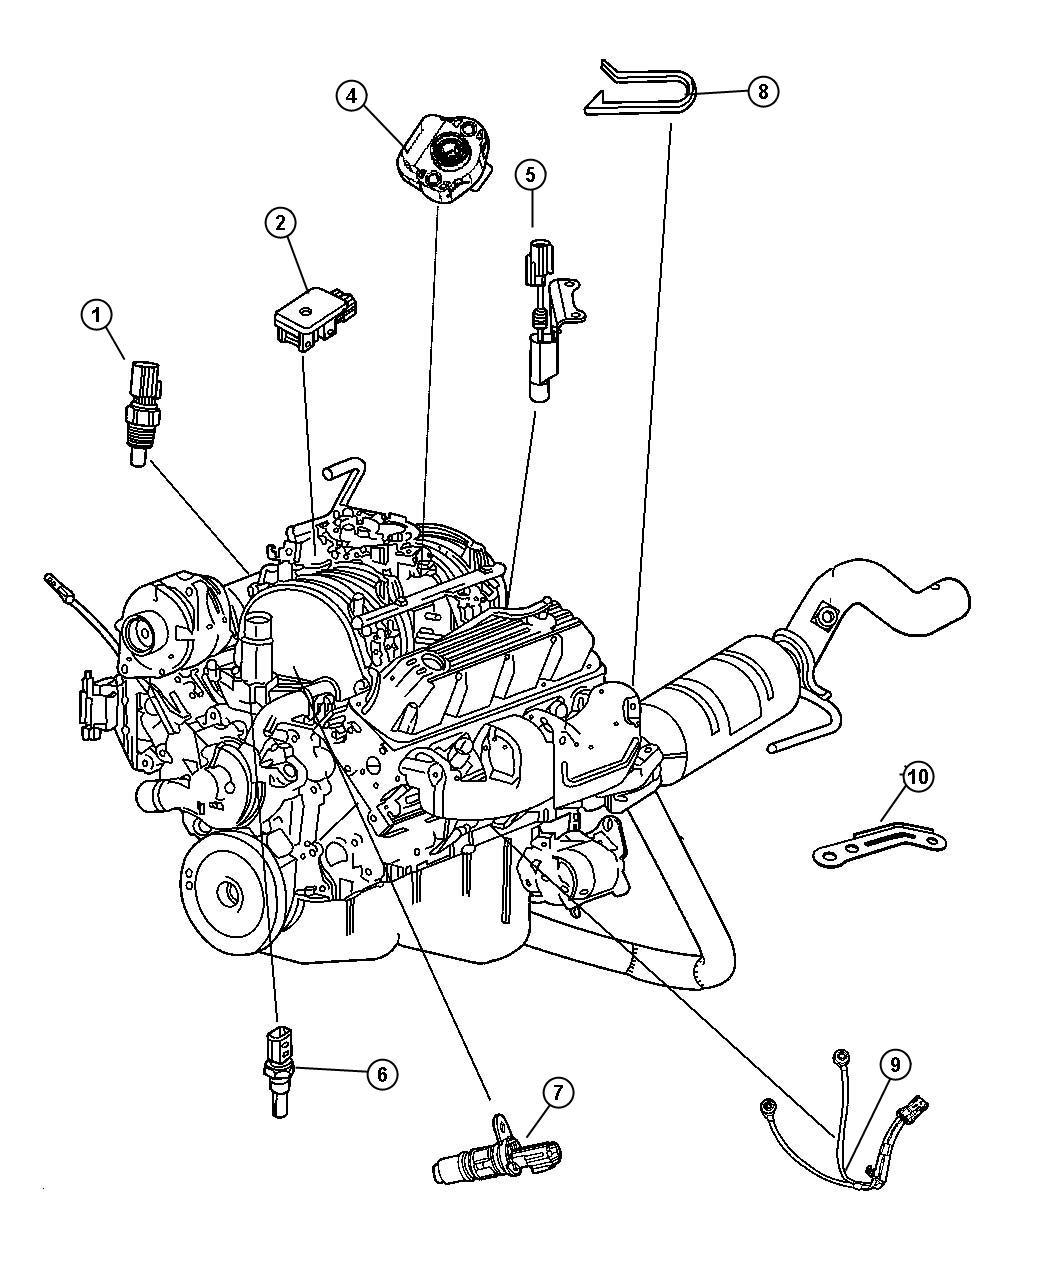 2001 Chrysler Concorde Engine Diagram / 2000 Chrysler 300m